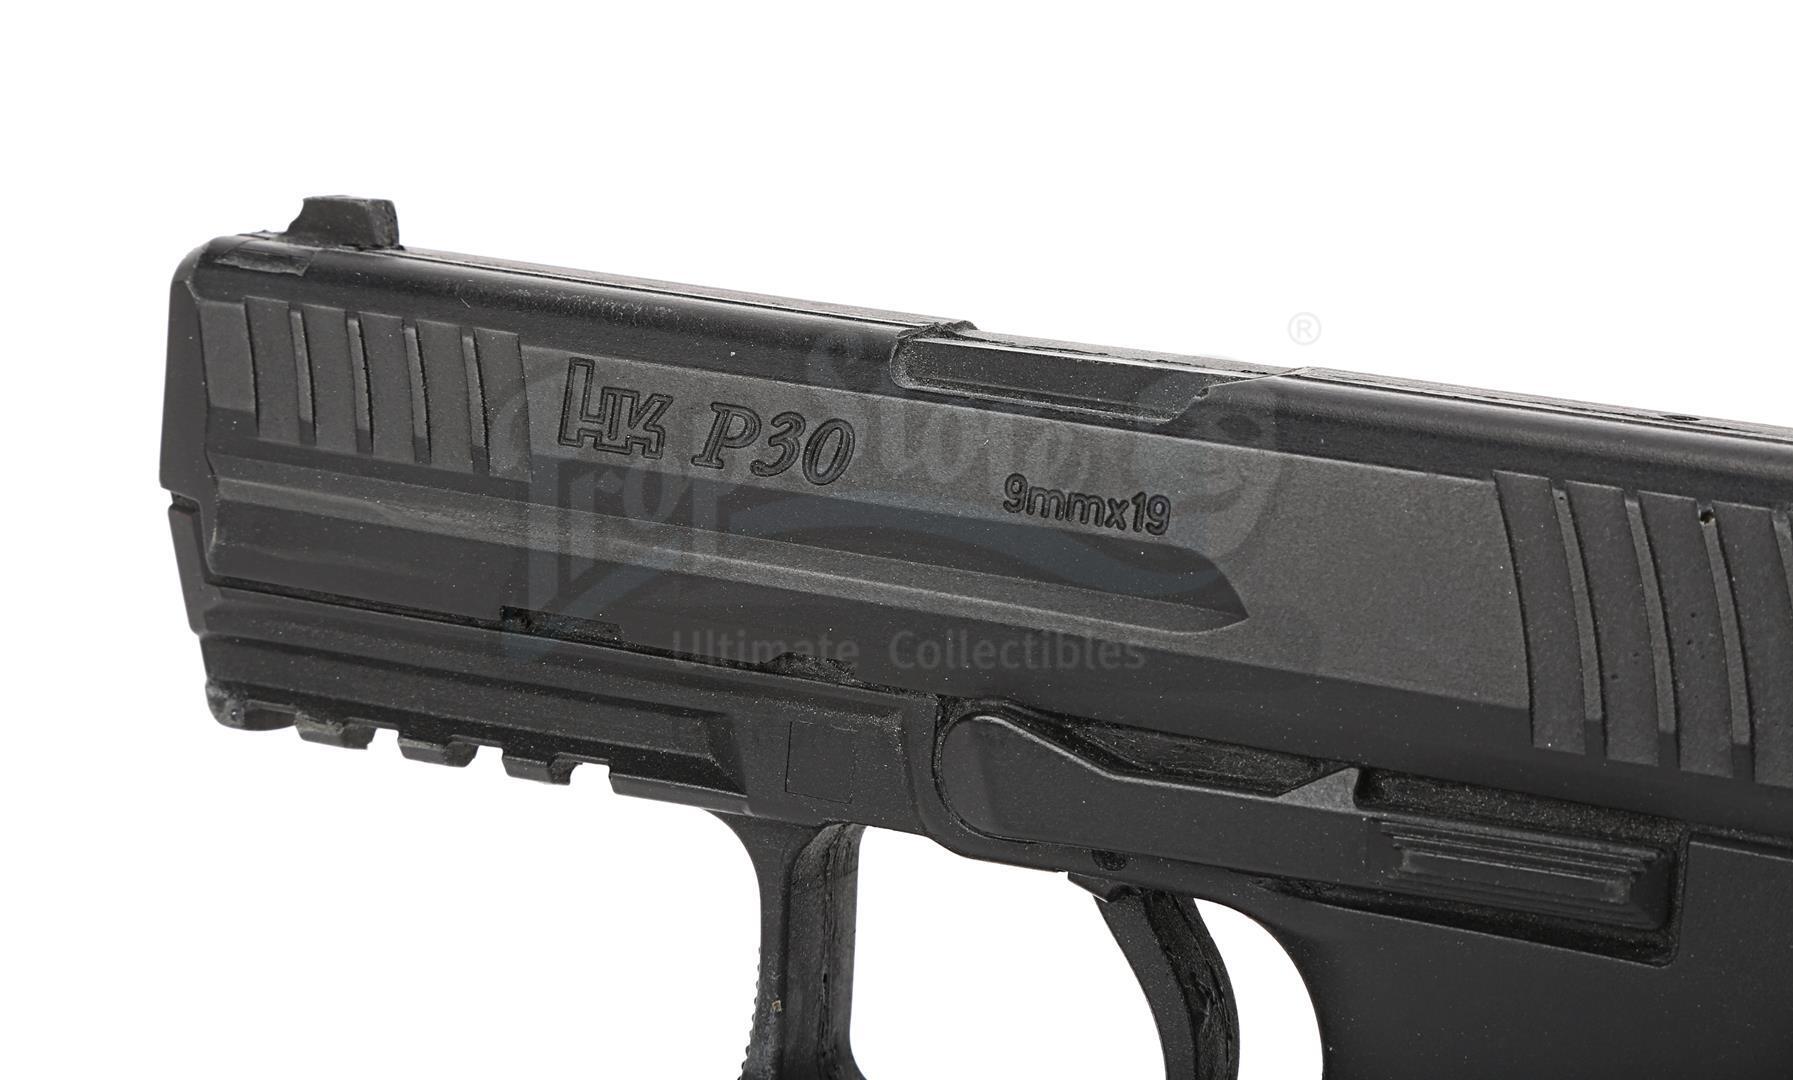 THE AVENGERS (2012) - Hawkeye's (Jeremy Renner) H&K P30 Stunt Pistol - Image 7 of 10